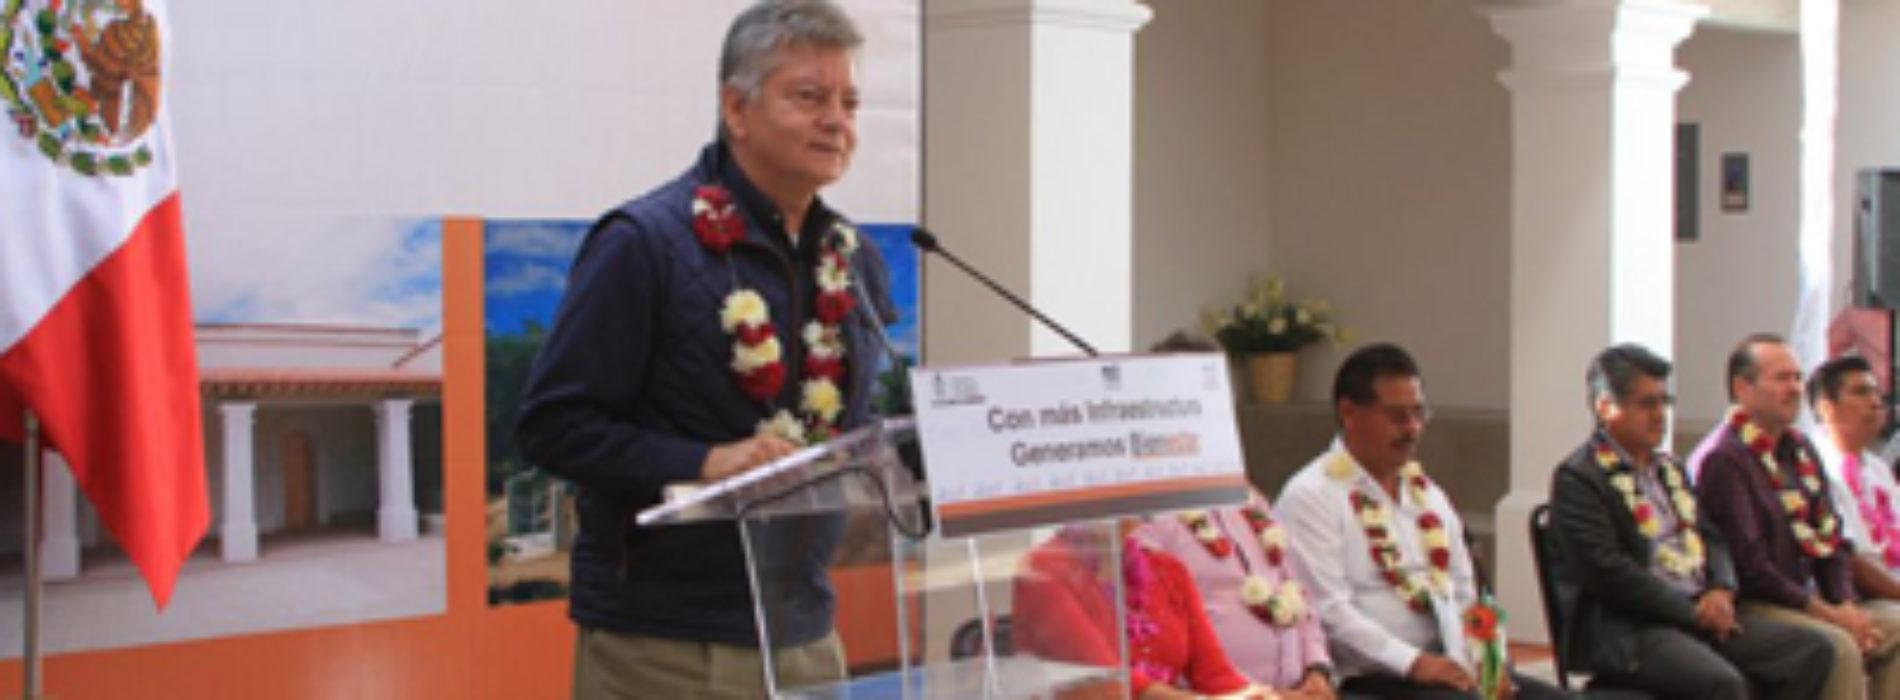 Inaugura Gobierno de Oaxaca obras de infraestructura social en Zautla